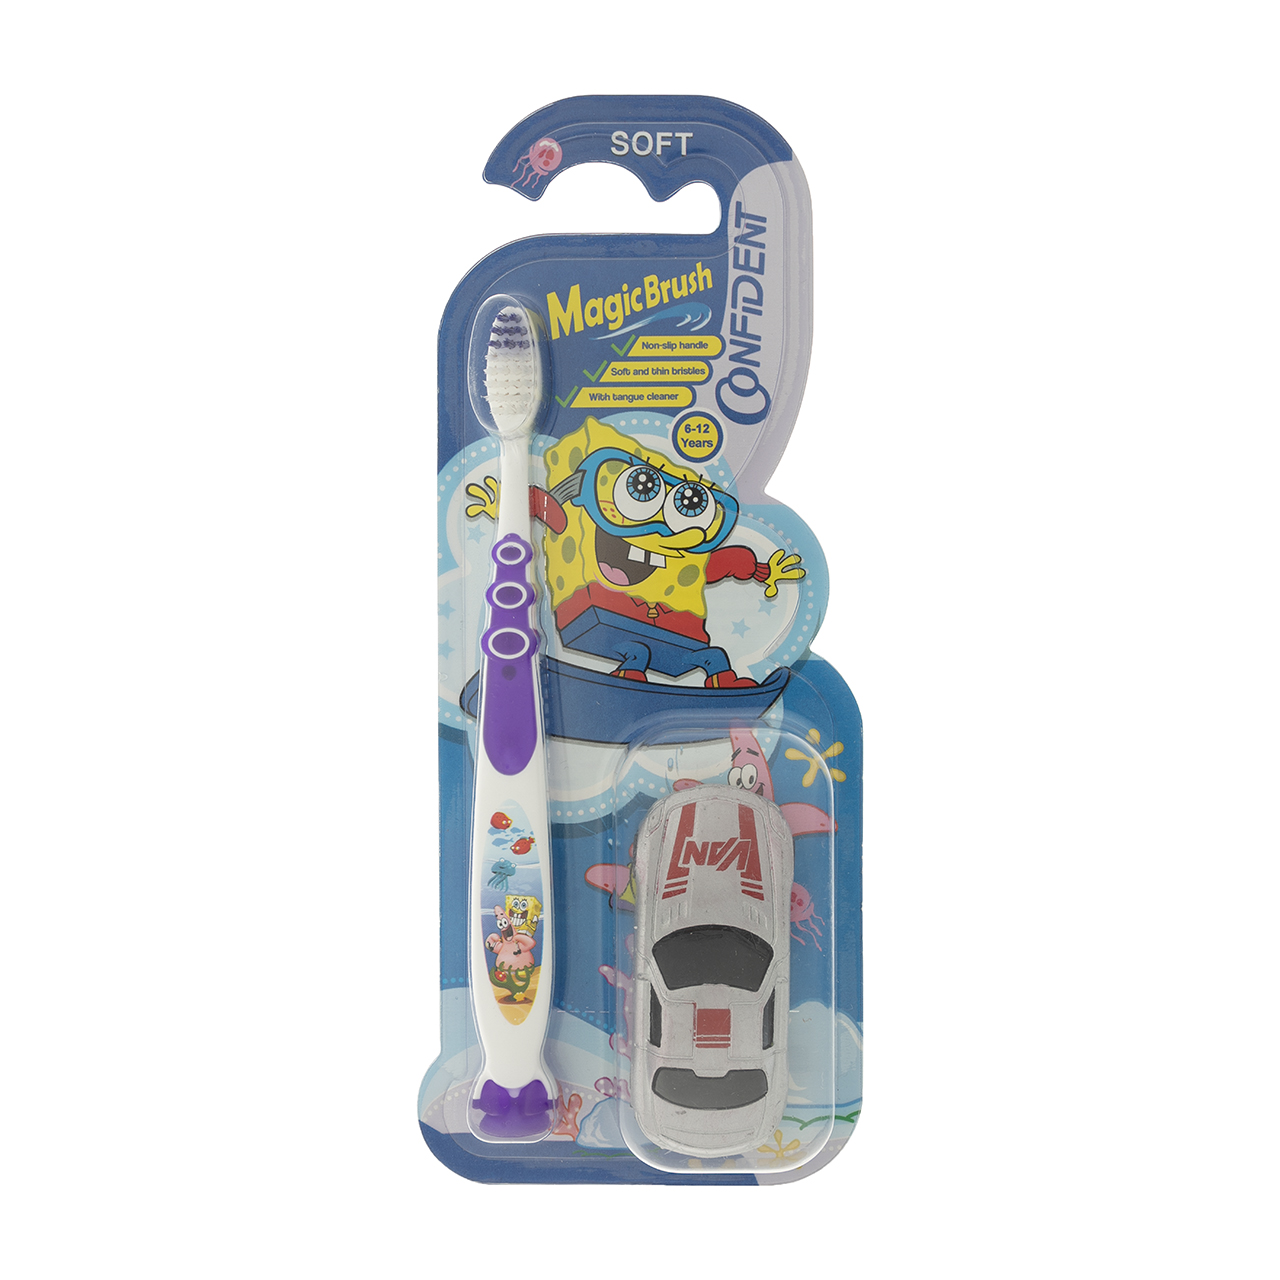 قیمت مسواک کودک کانفیدنت مدل Magic Brush